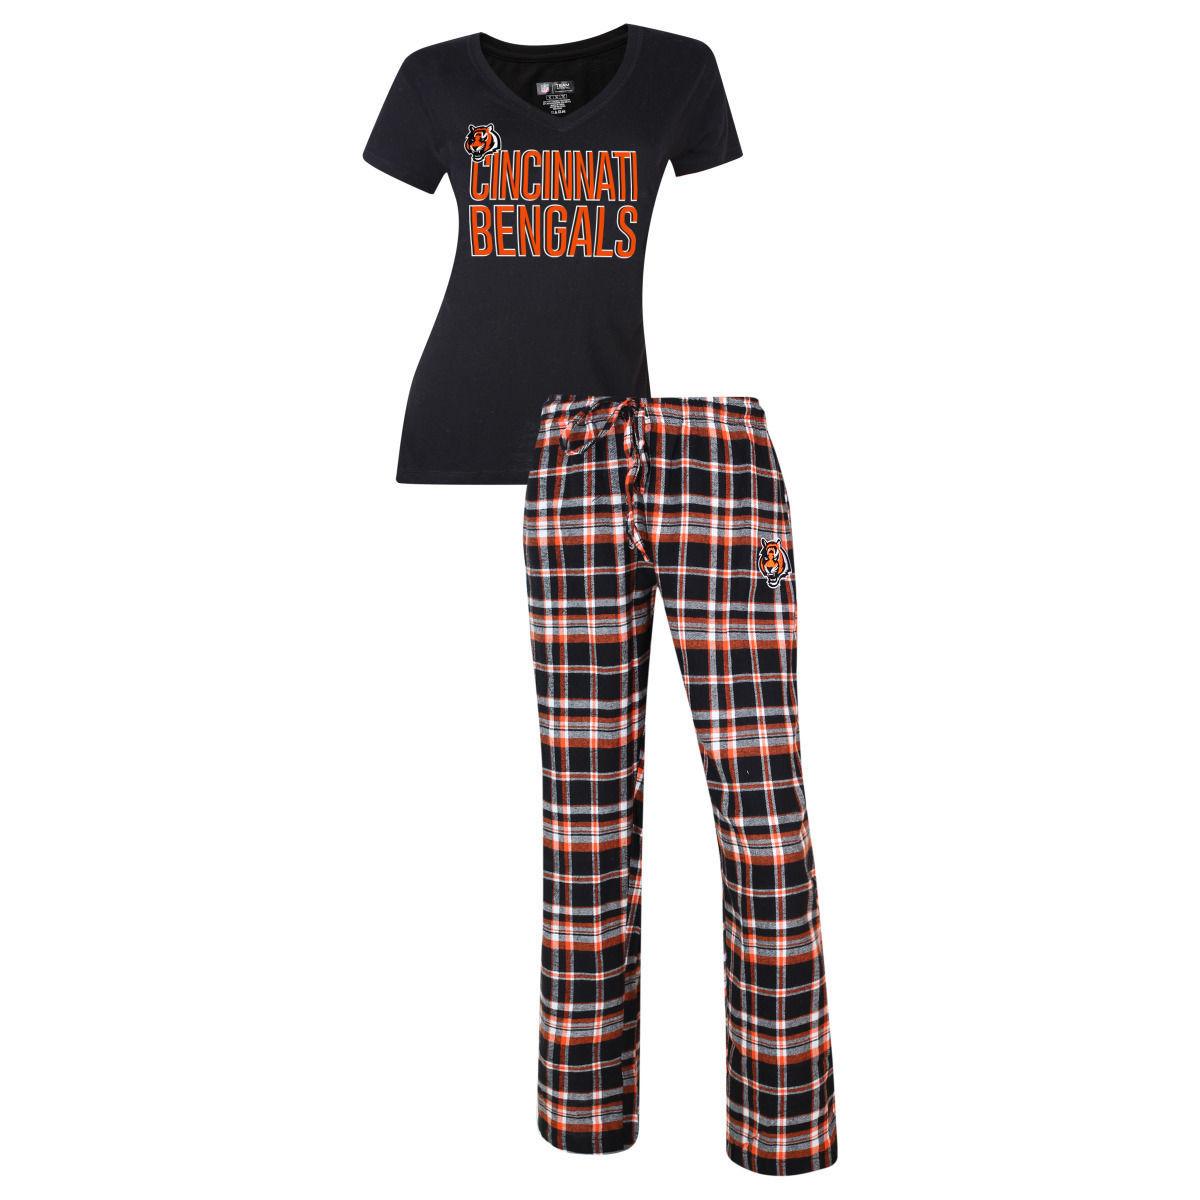 Cincinnati Bengals Women's Pajamas Tiebreaker NFL Sleep Set Shirt Plaid Pants